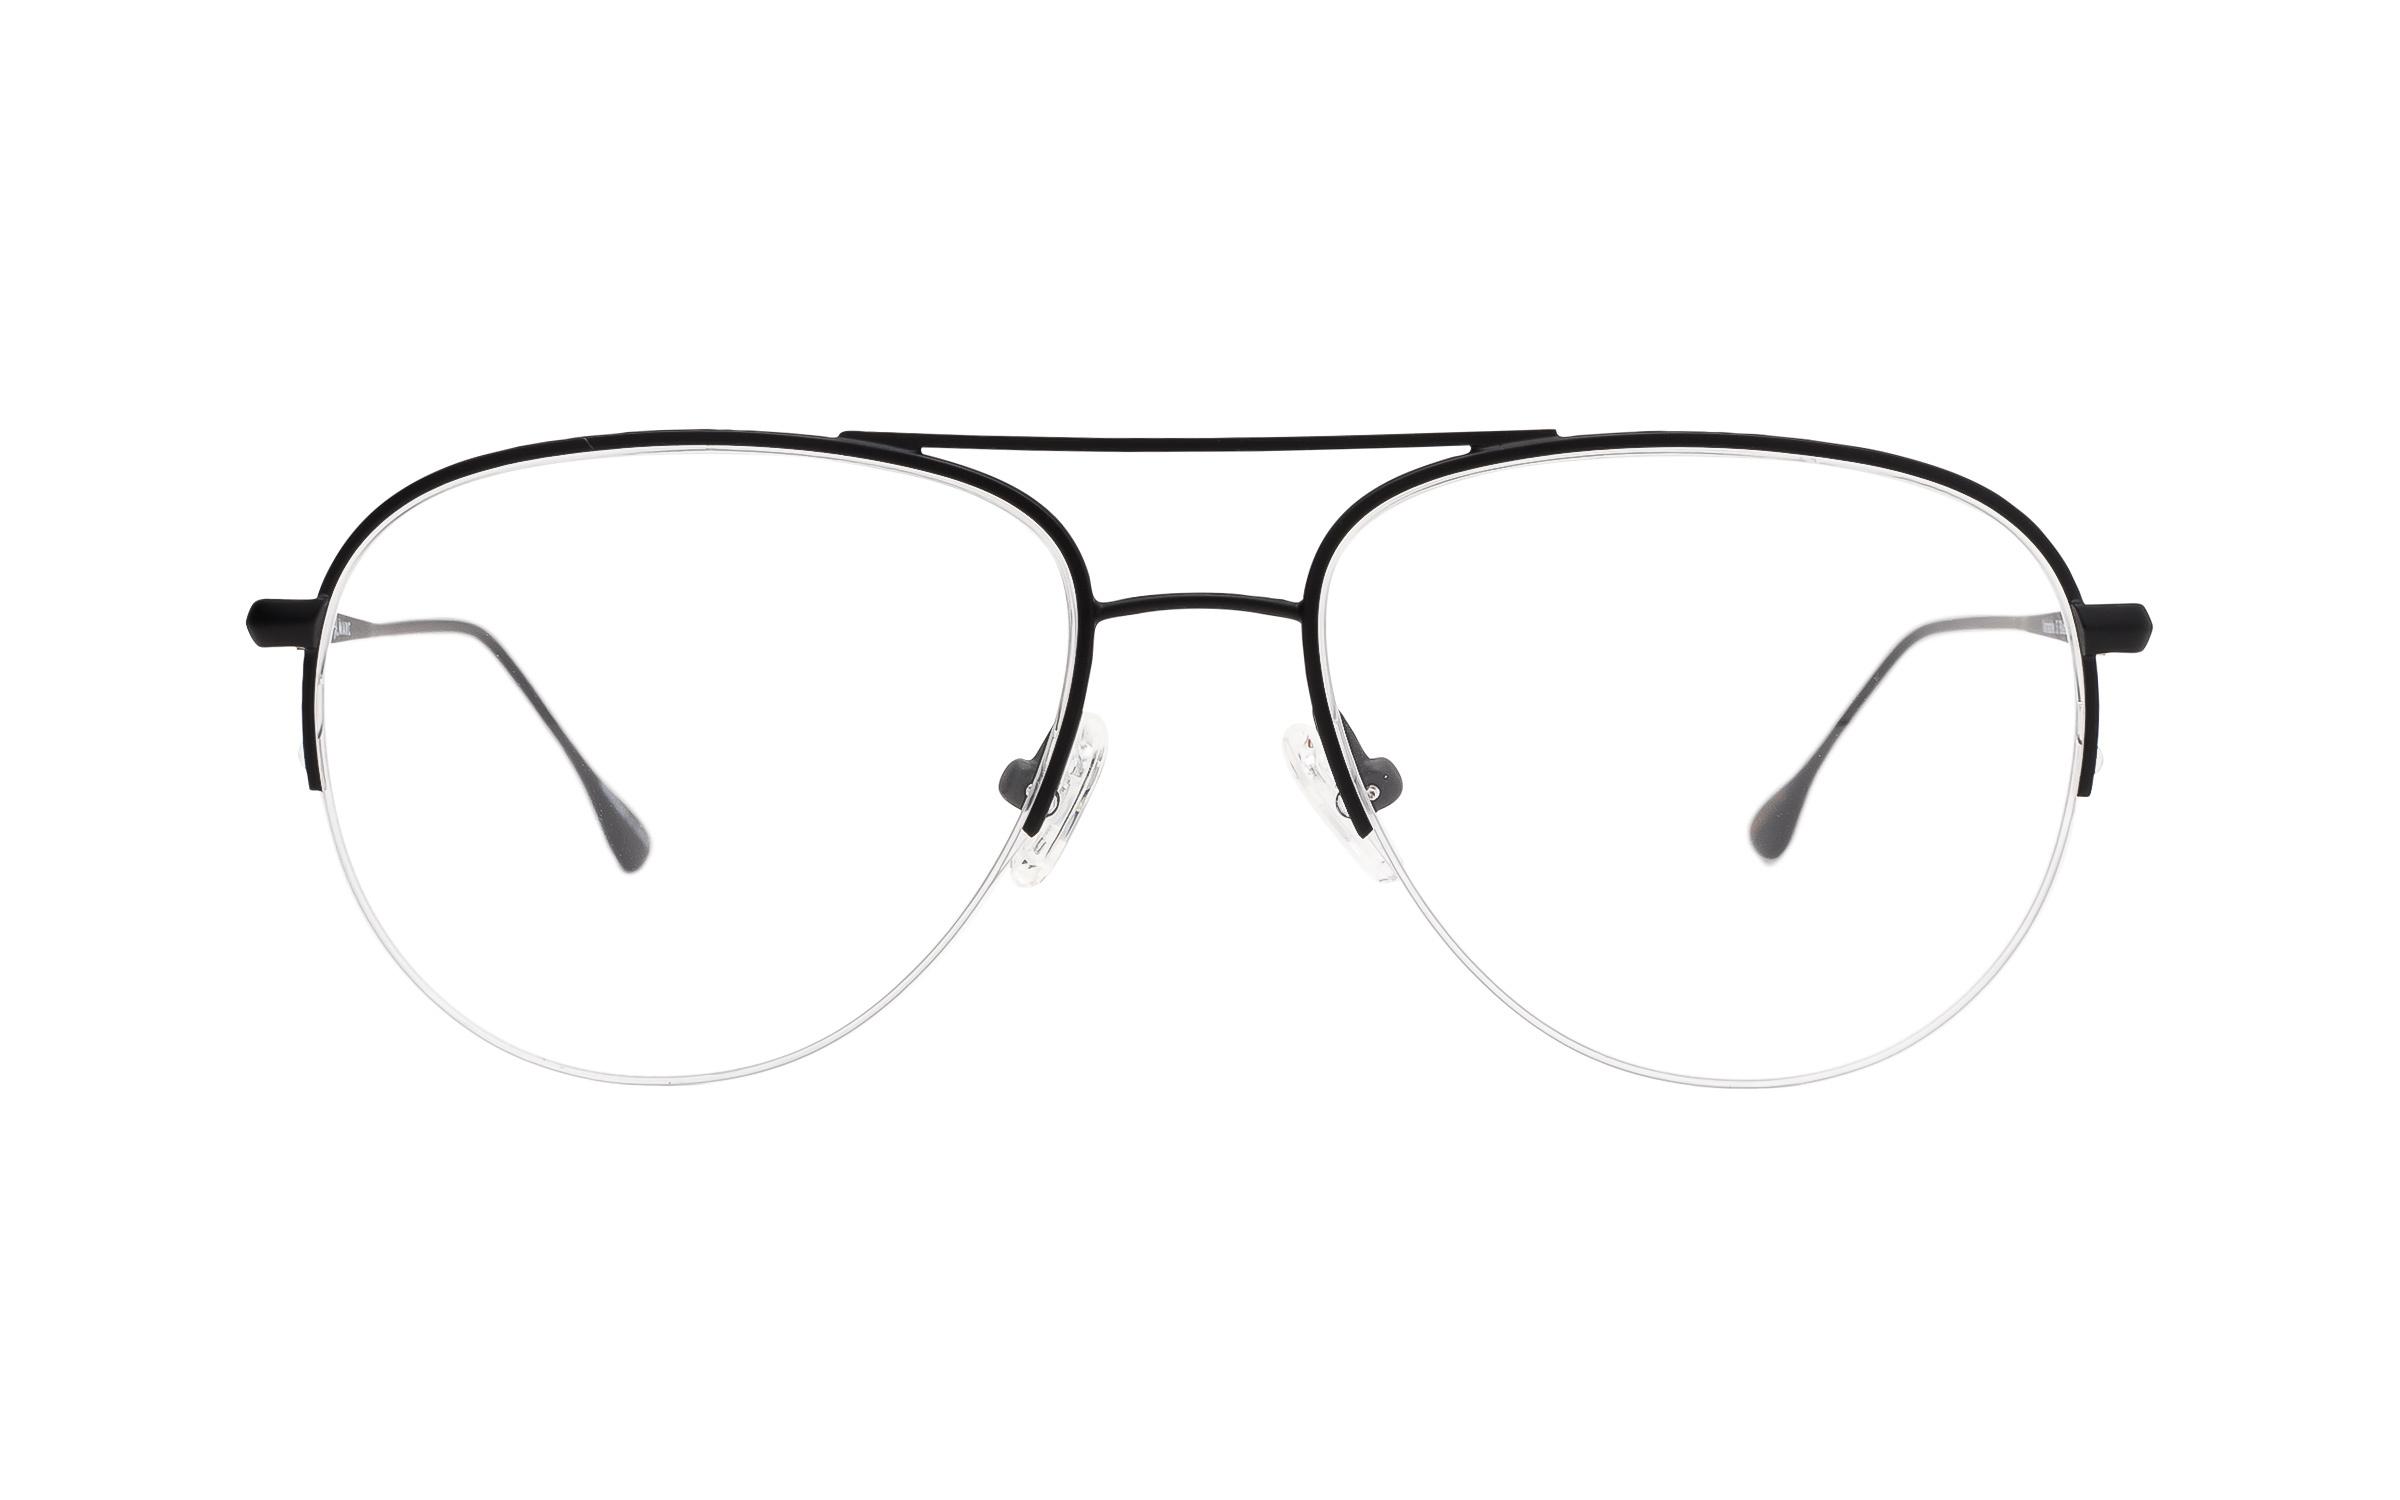 Black Metal Vintage Joseph Marc Glasses - Clearly Glasses Online